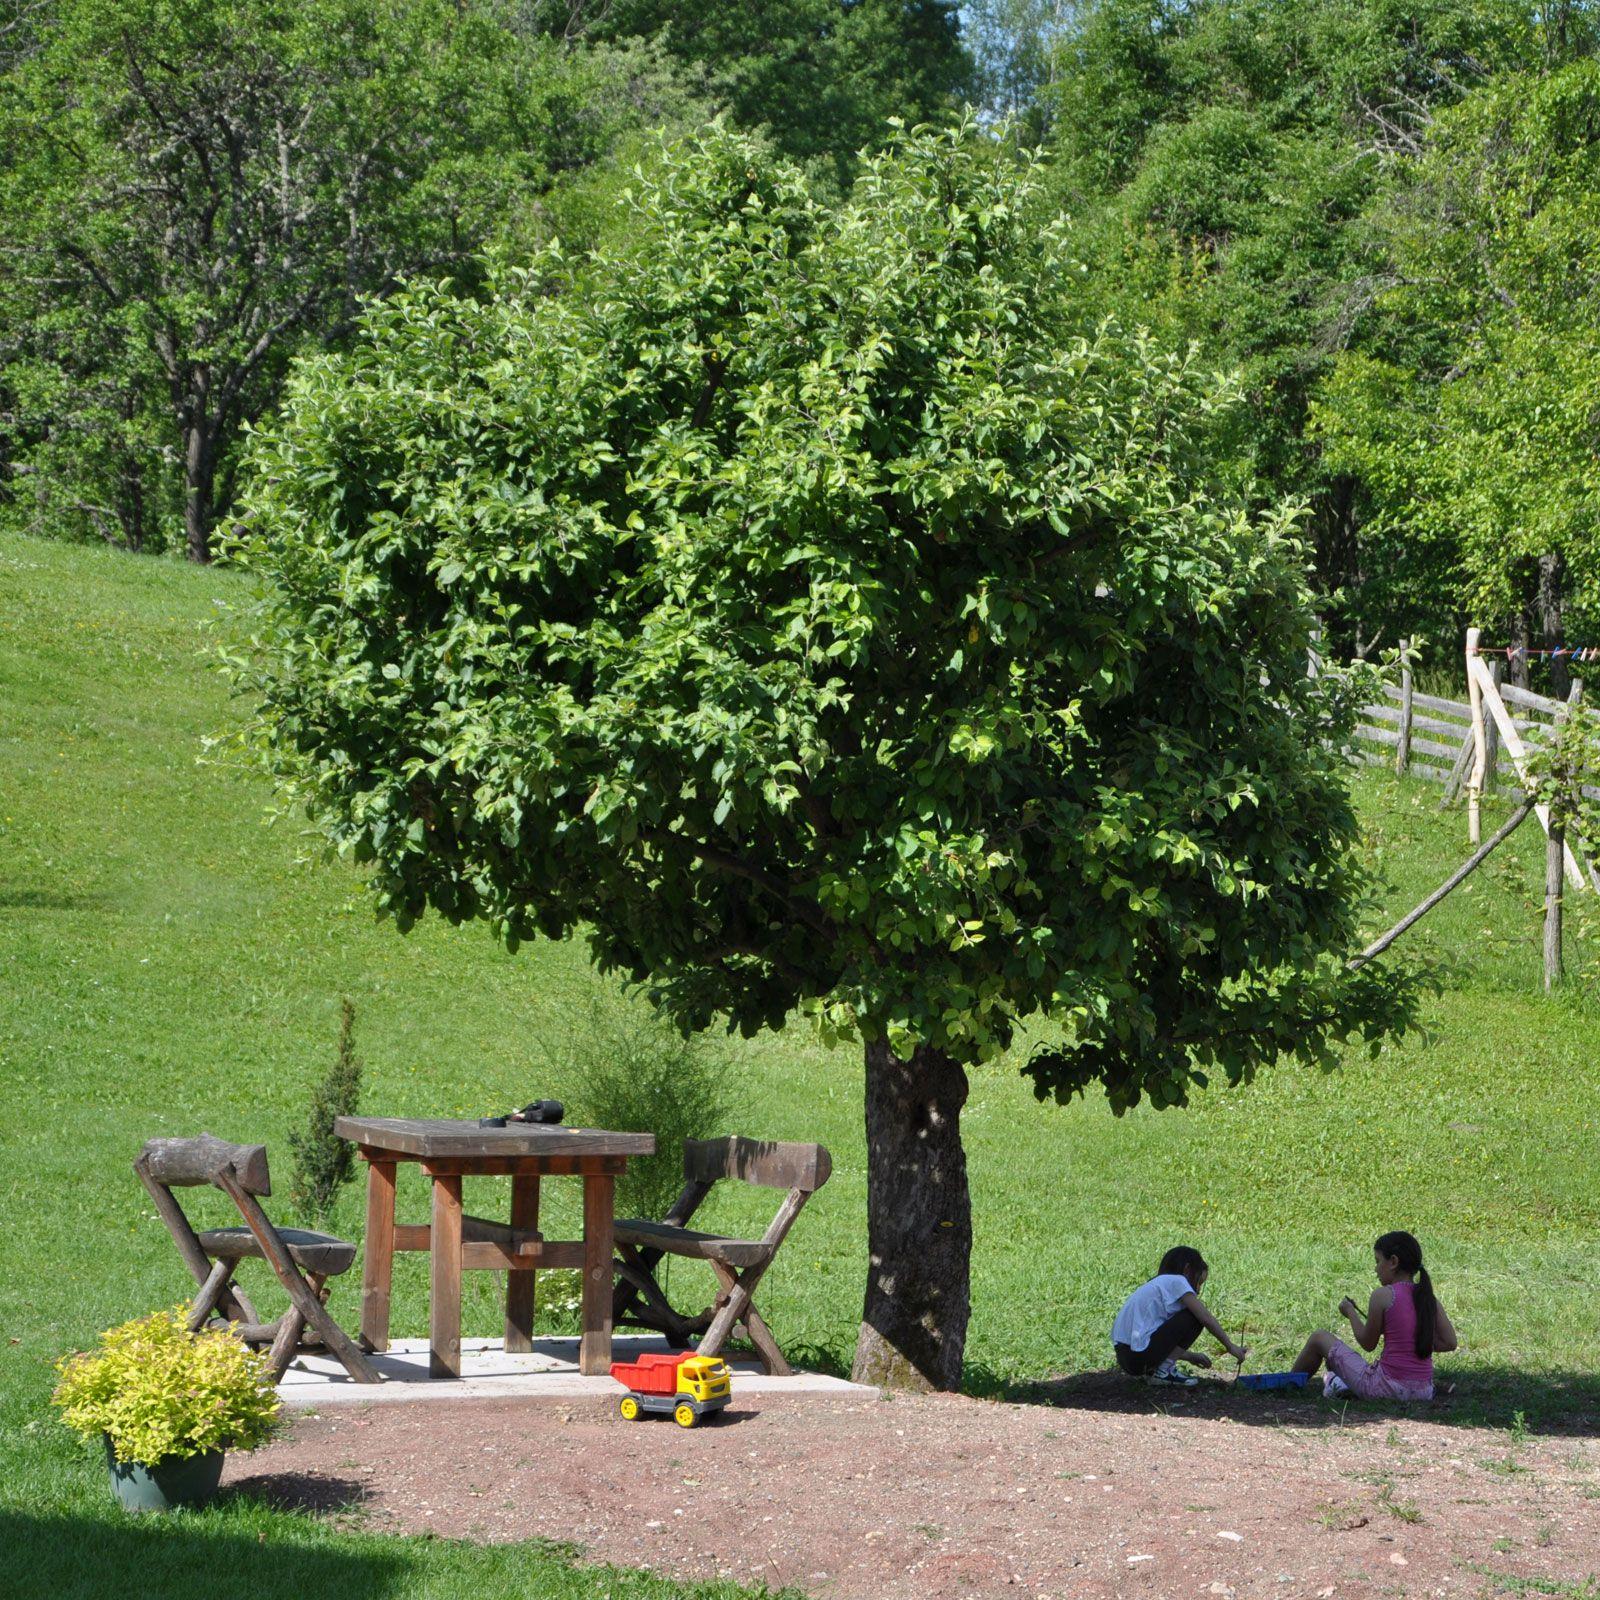 selo mionica kod kosjeria domainstvo milogoe village mionica near kosjeric serbia village